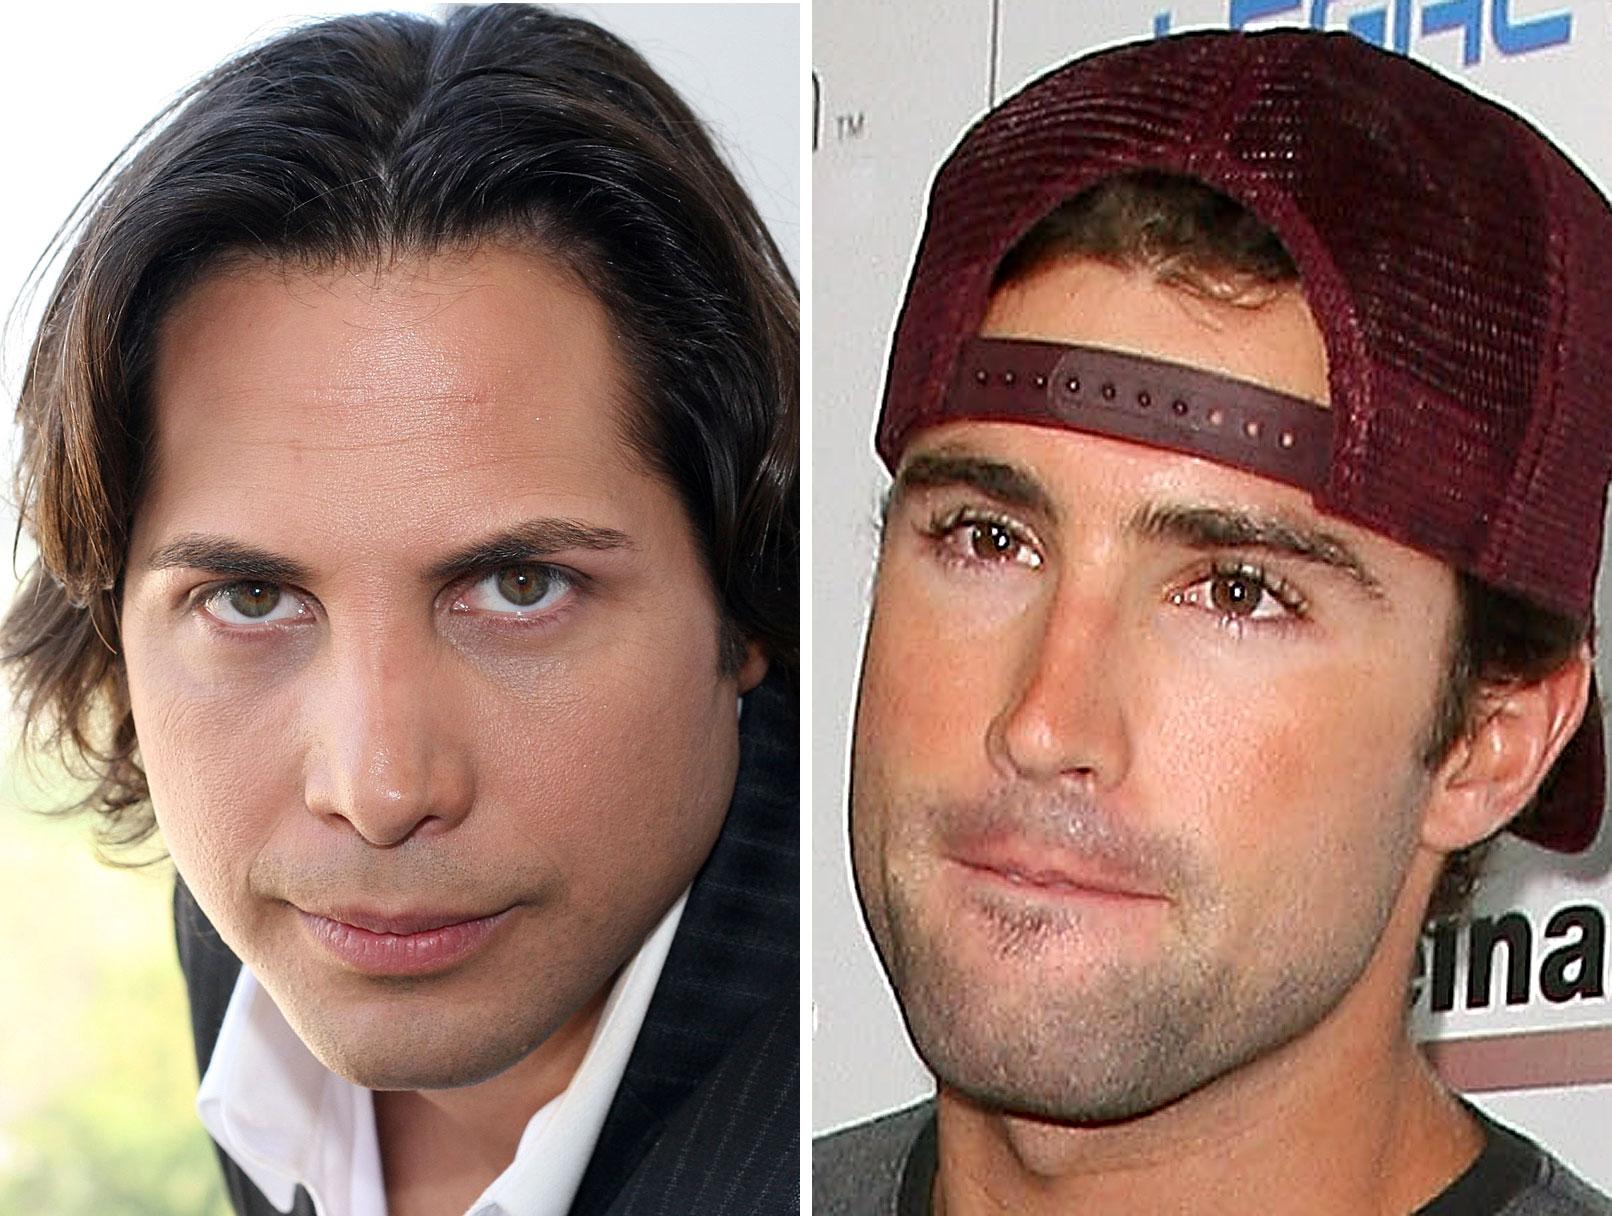 Joe Francis and Brody Jenner: No Bro-Mance Here